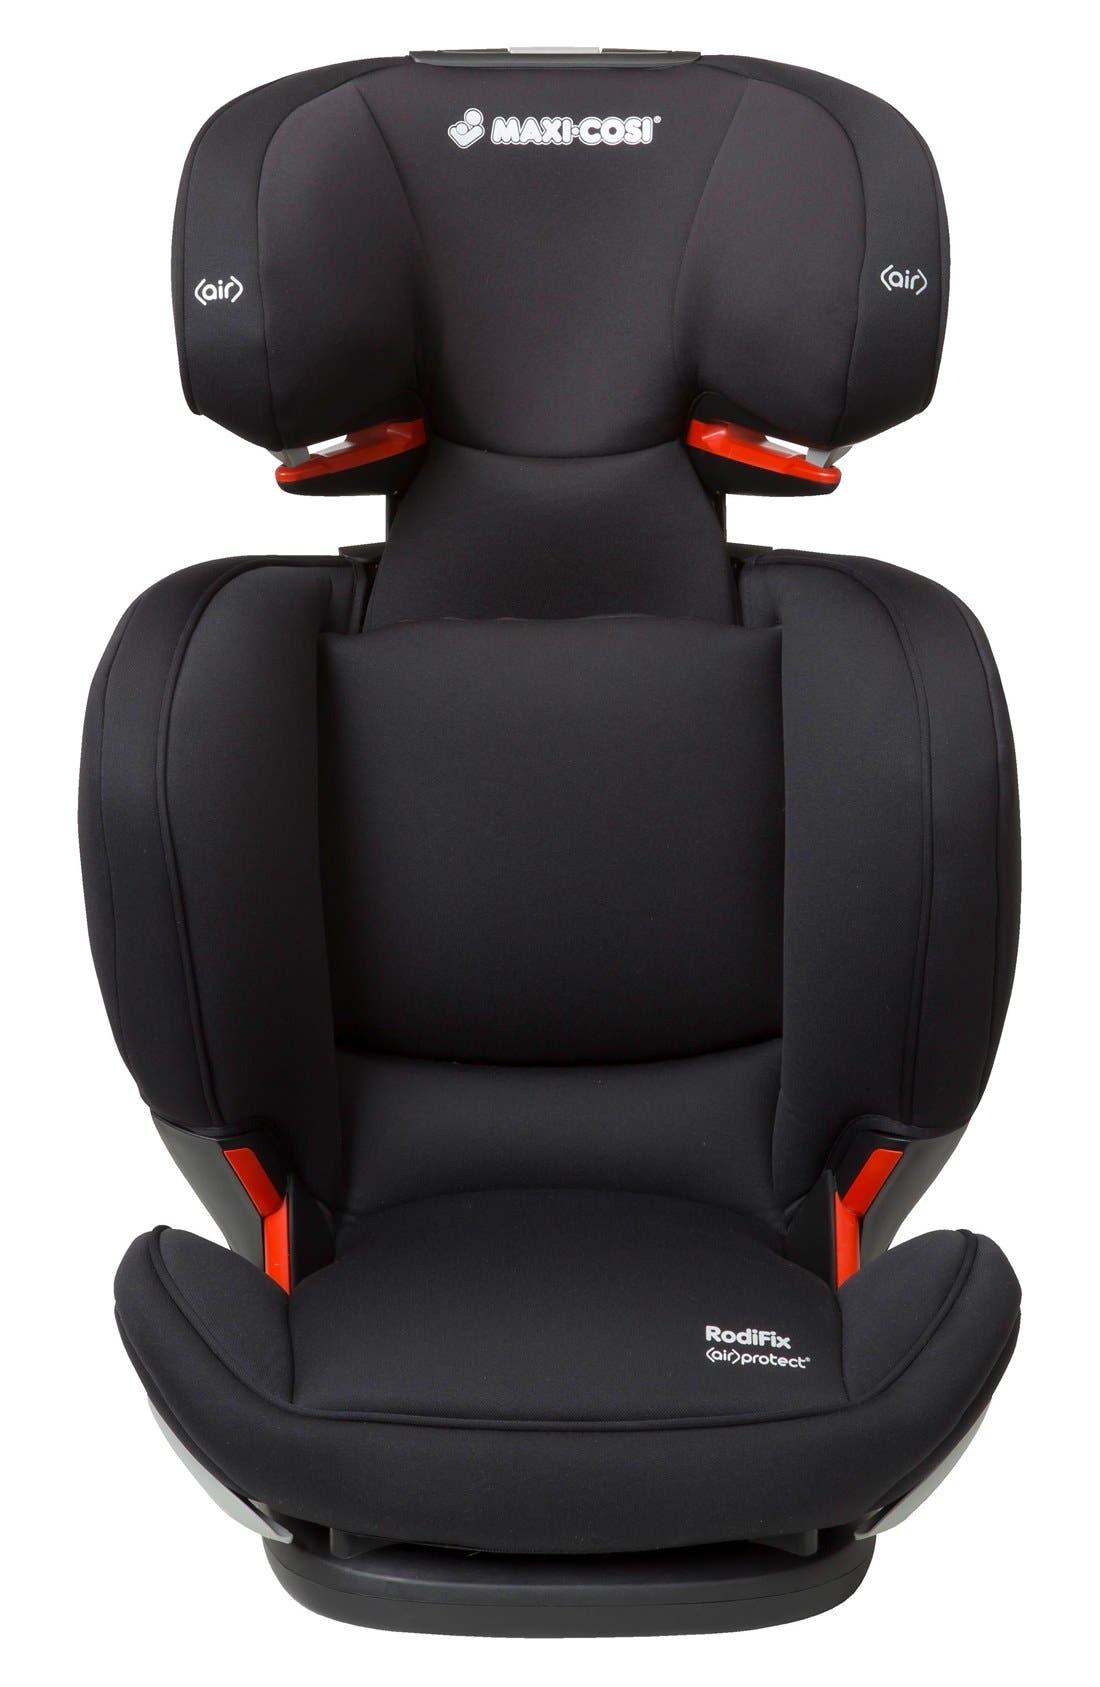 RodiFix Booster Car Seat,                             Main thumbnail 1, color,                             005